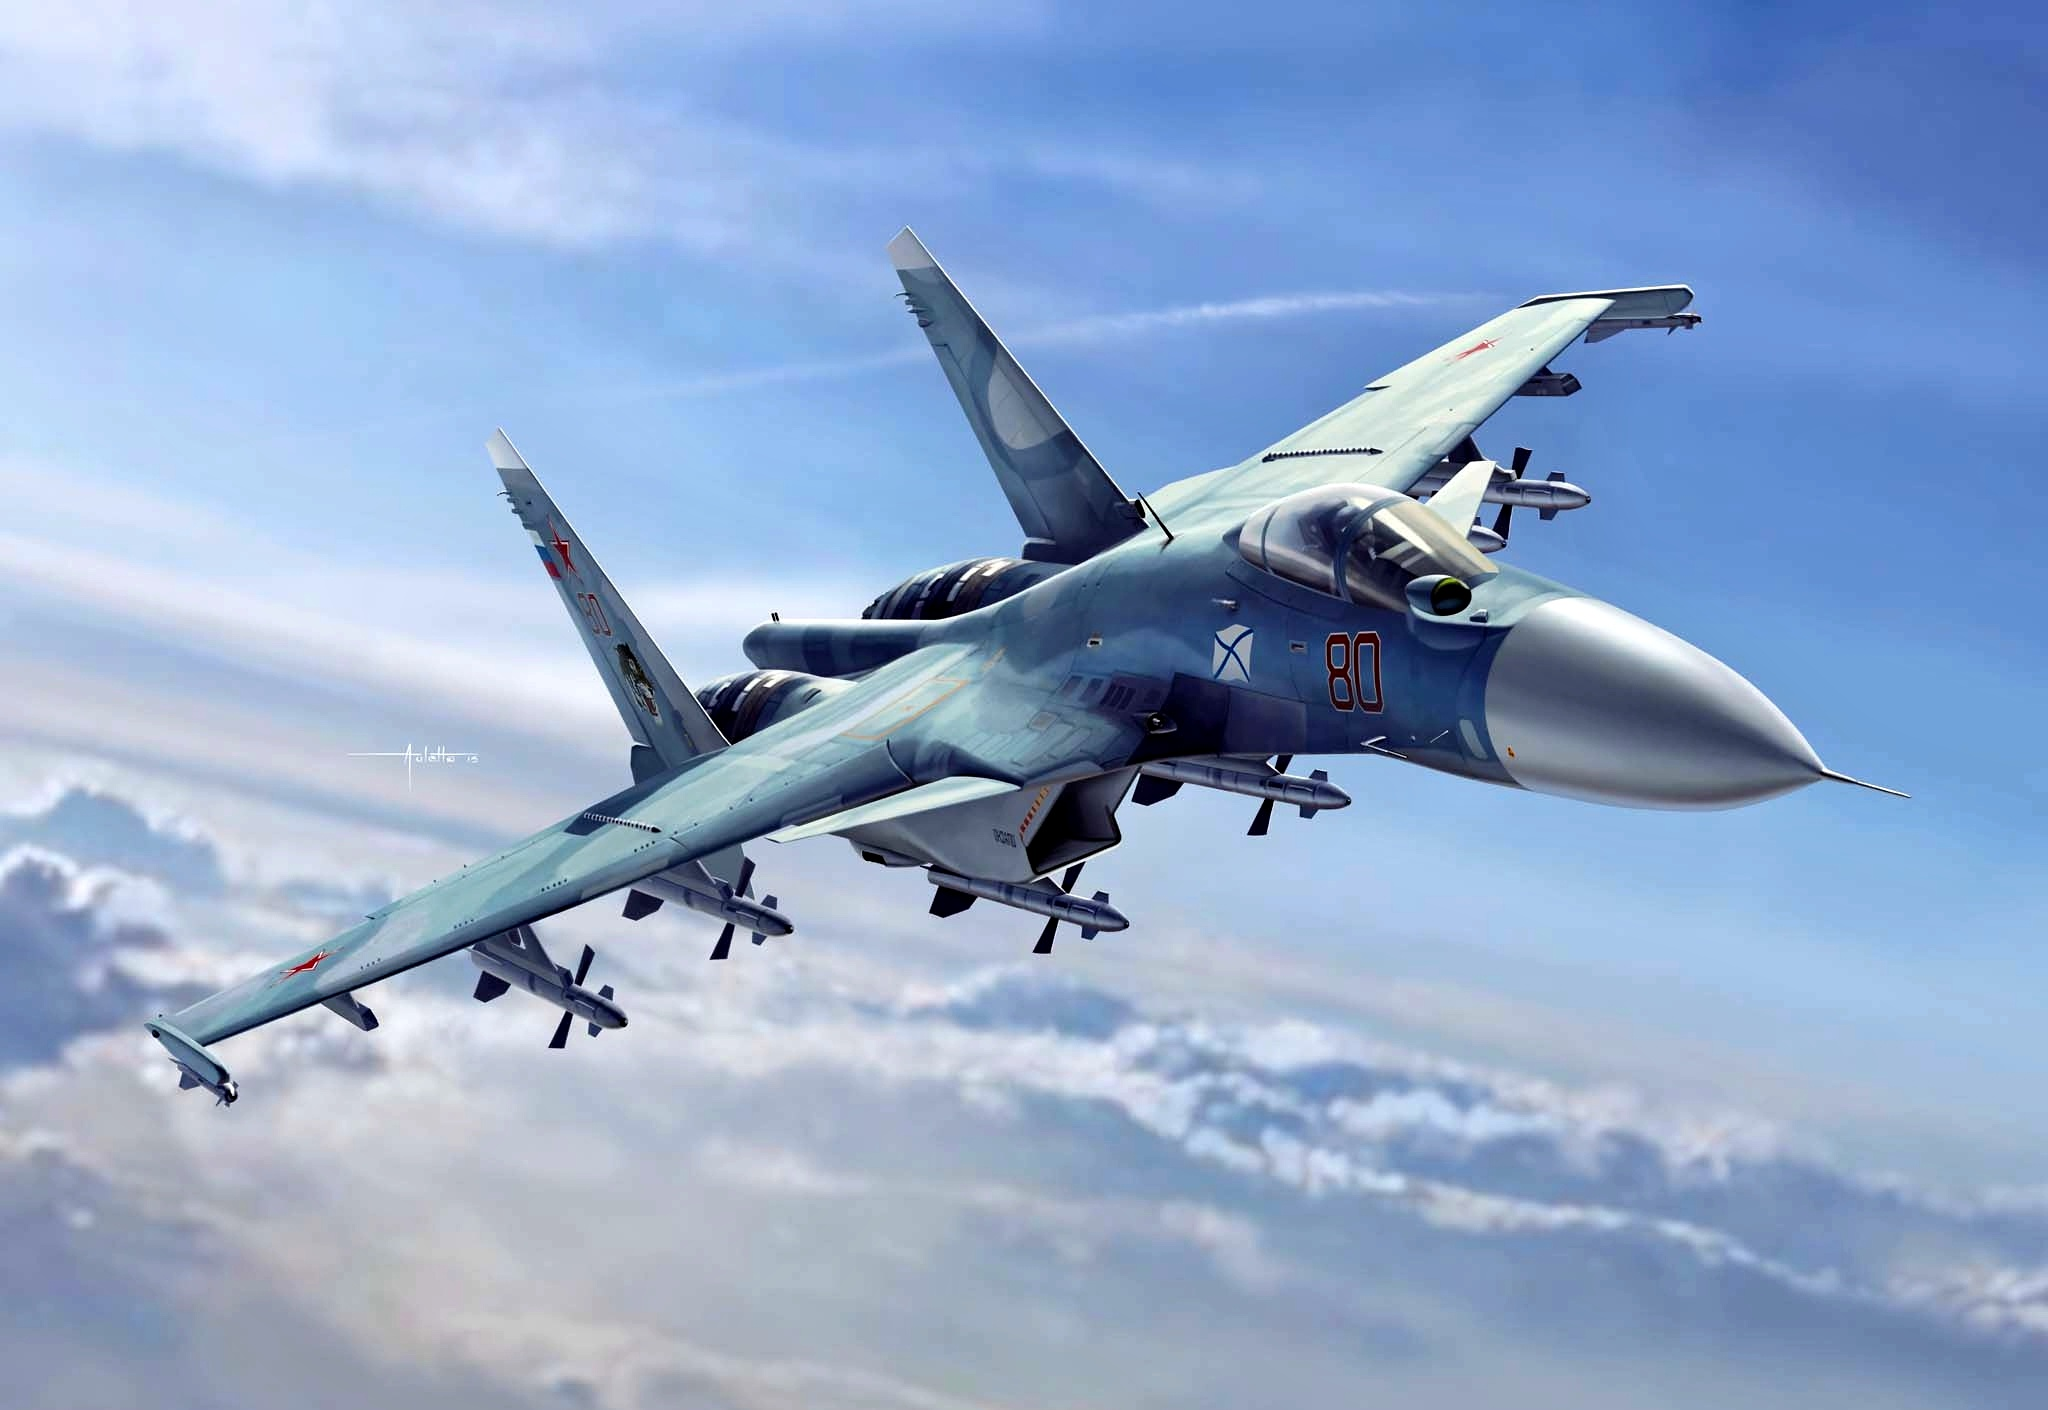 Sukhoi Su 33 HD Wallpaper Background Image 2048x1410 ID 2048x1410